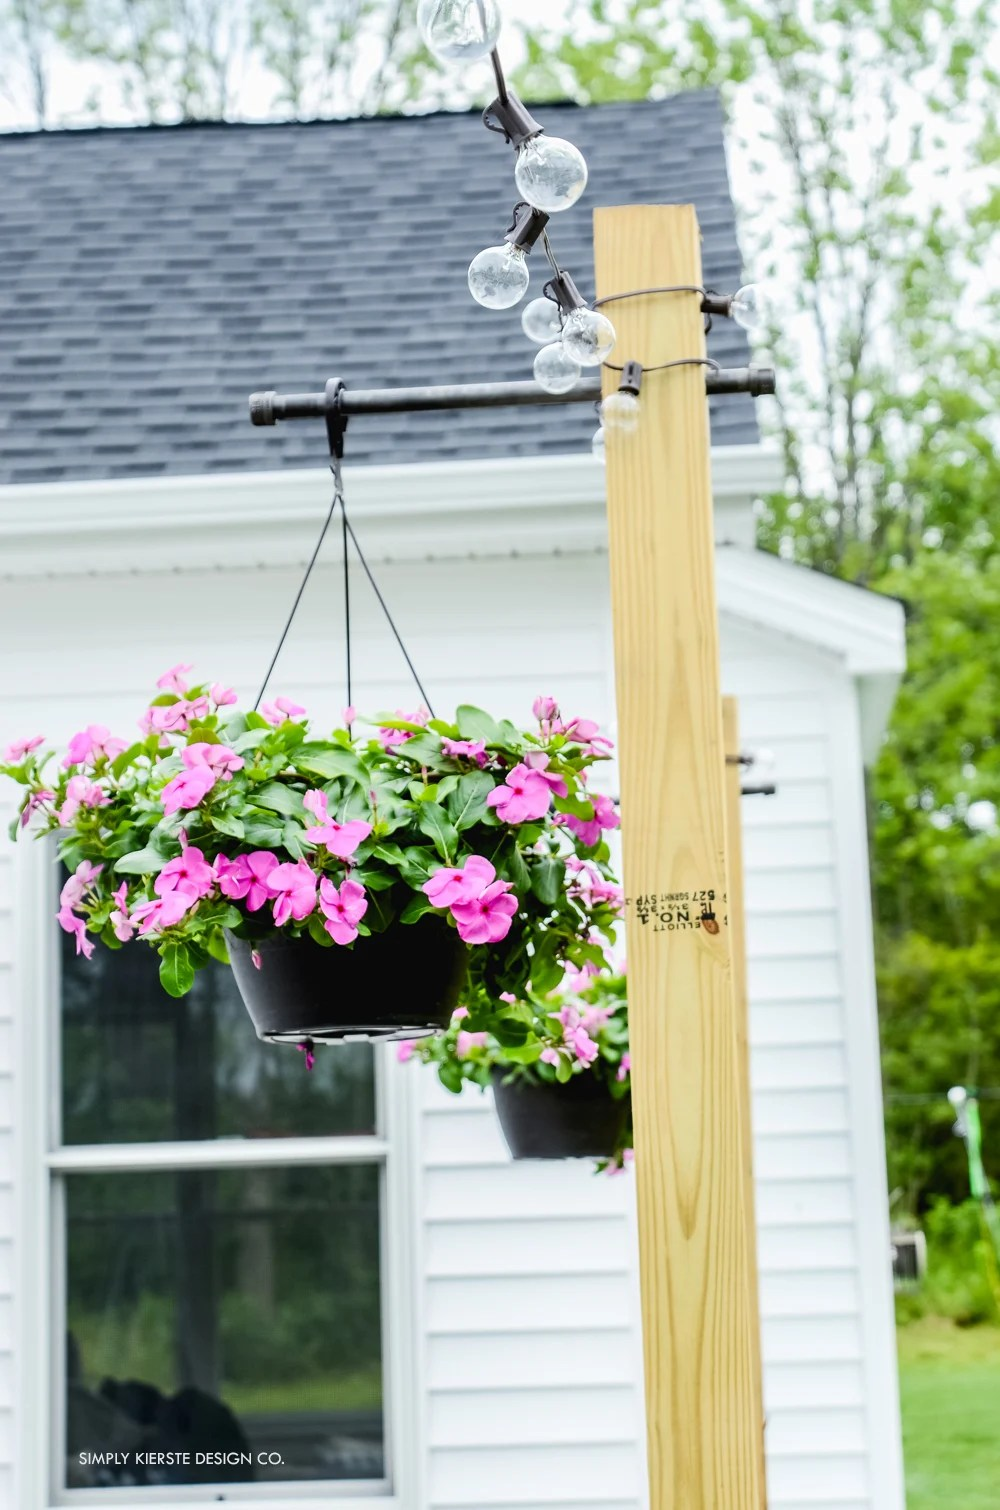 DIY Posts for Outdoor String Lights - Old Salt Farm on Backyard String Lights Diy  id=44473